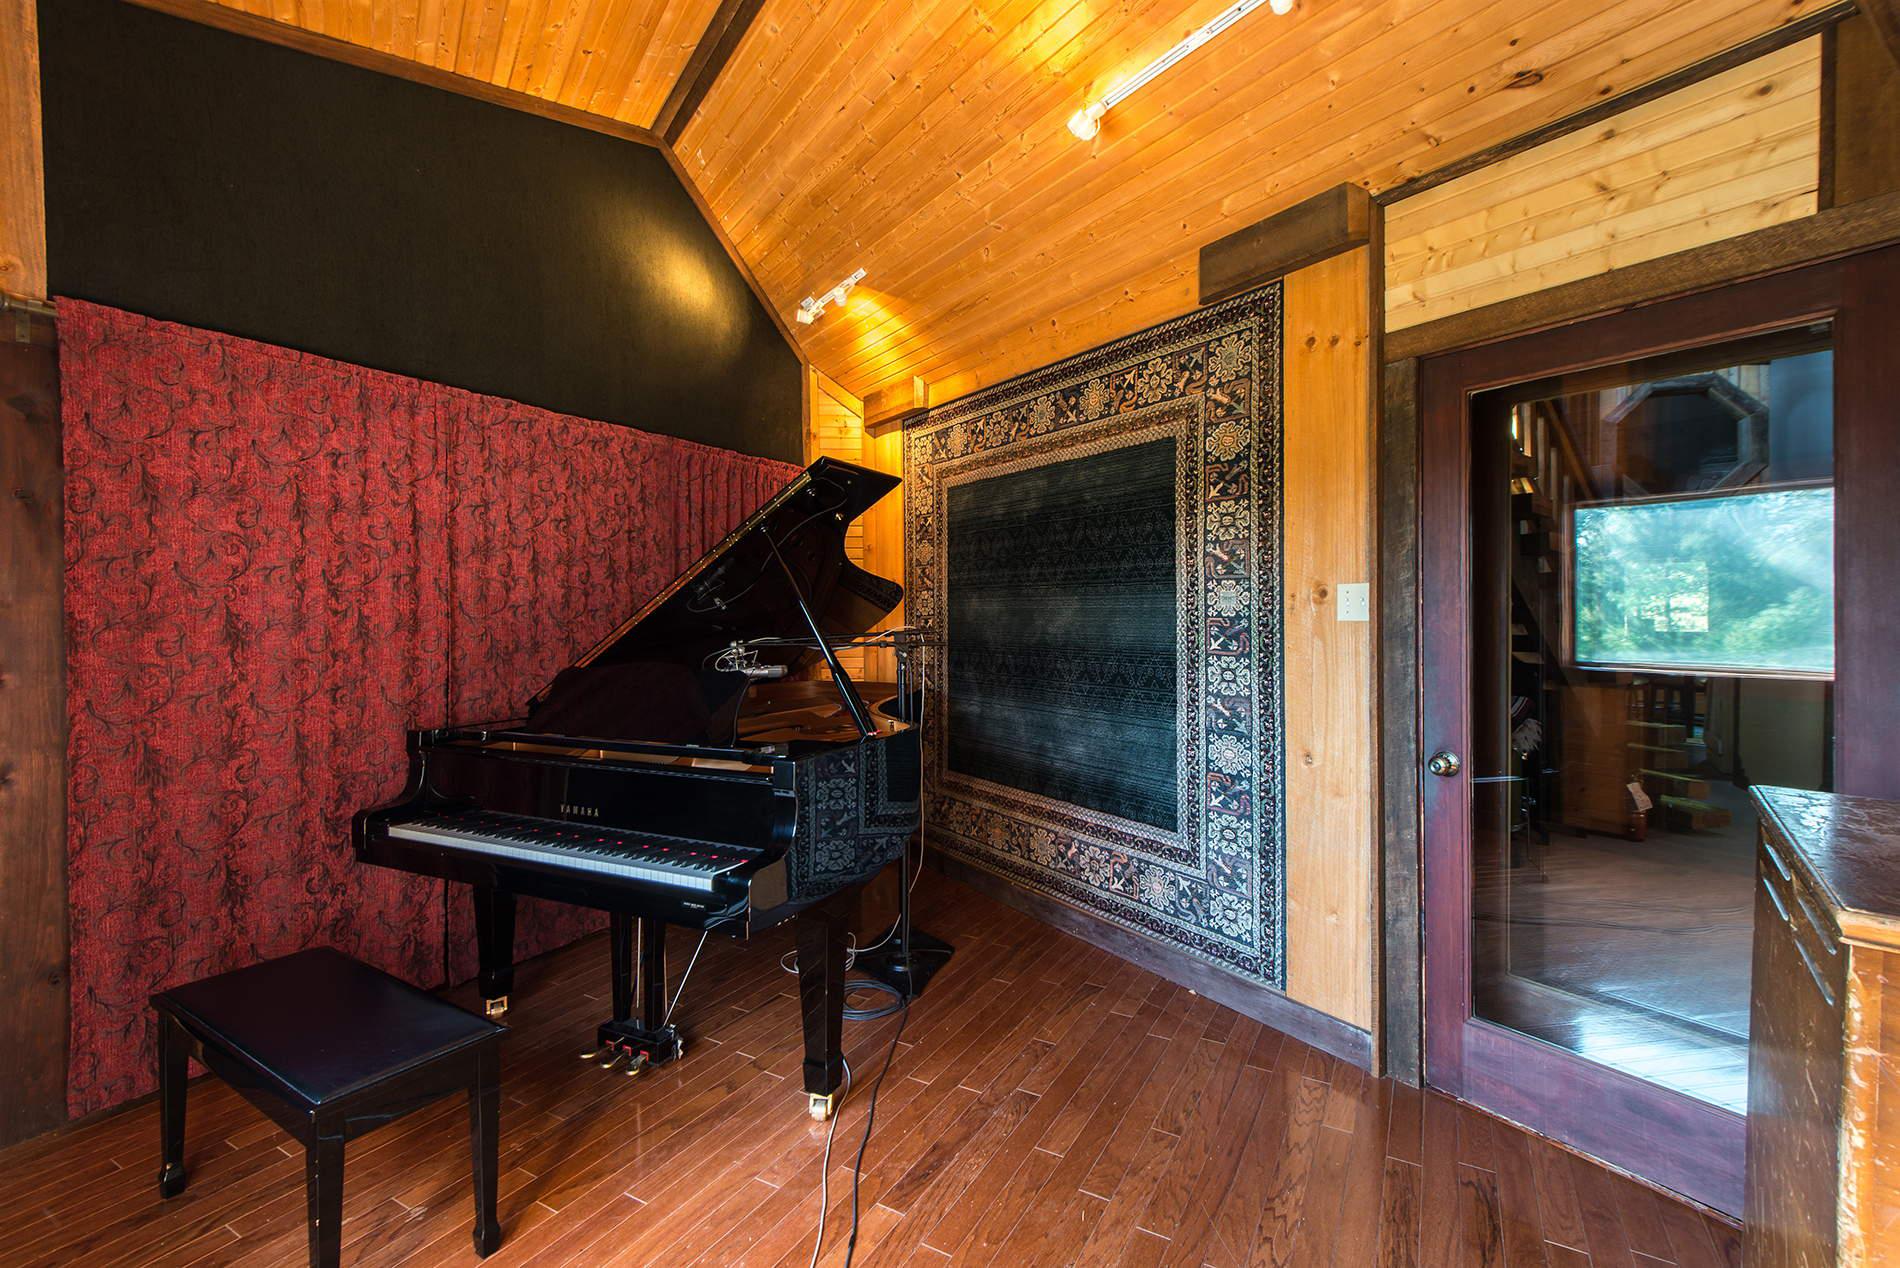 The Lodge Piano Room